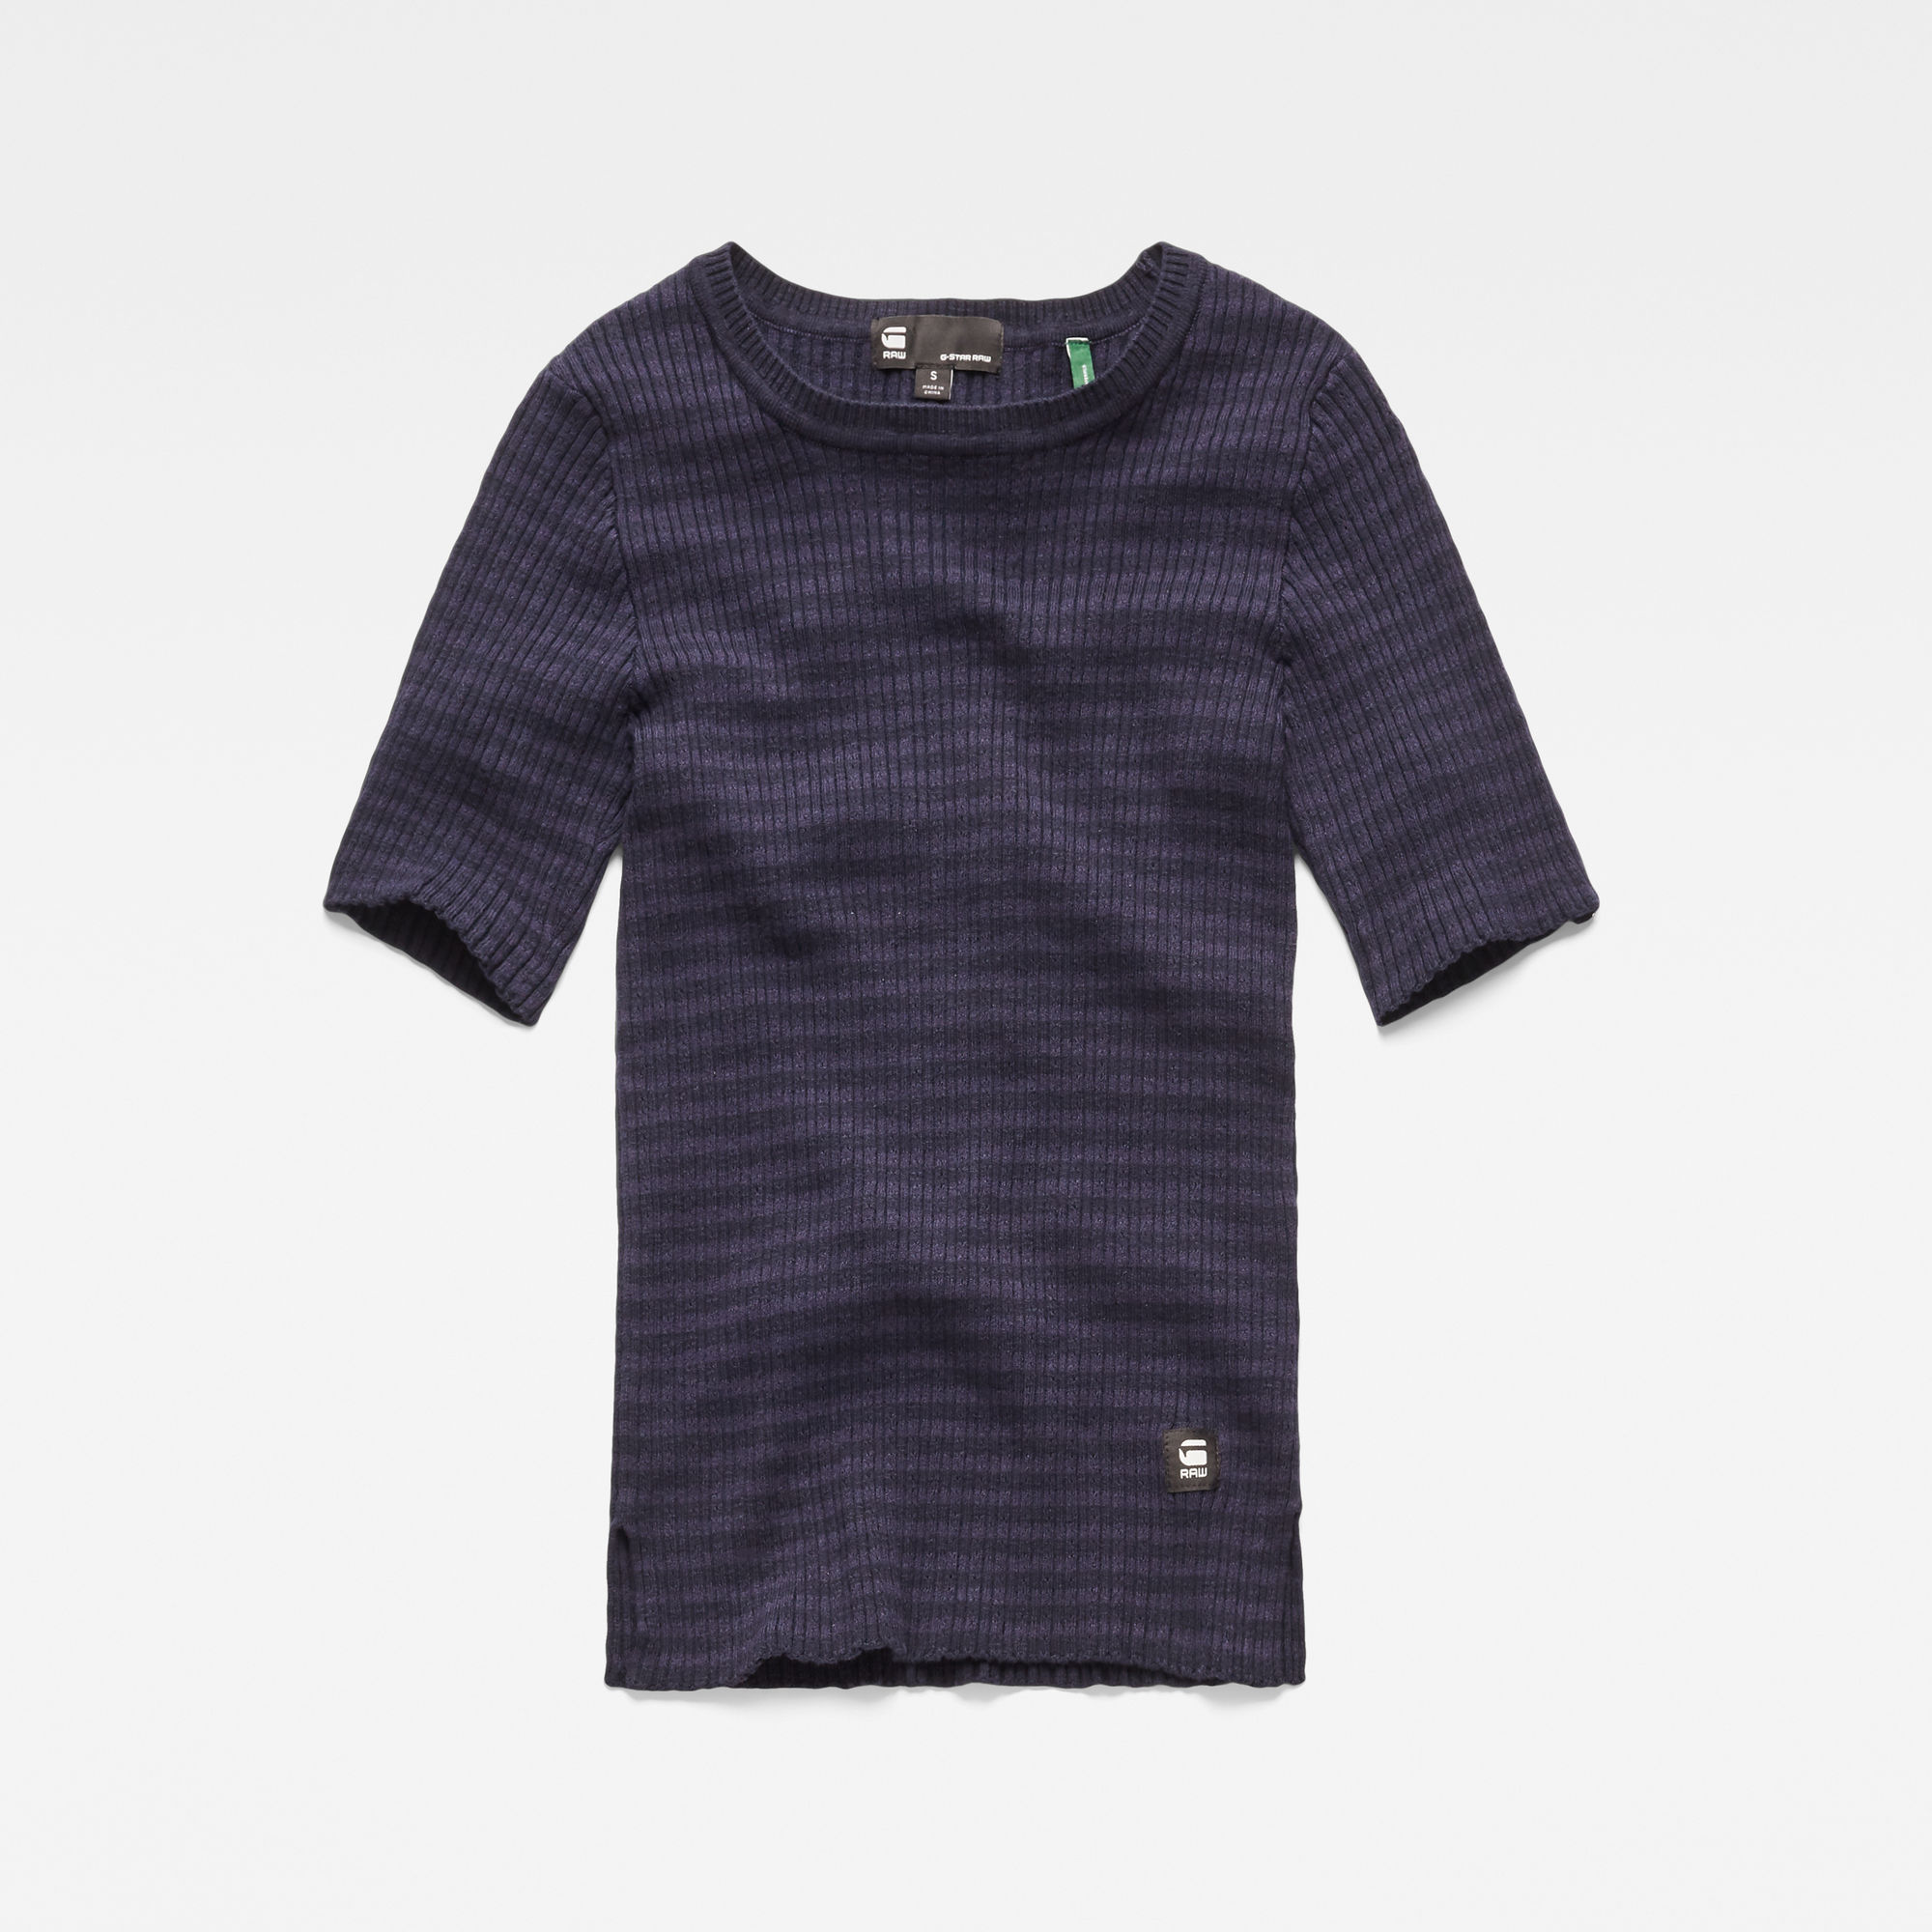 Camiseta Silber Knit